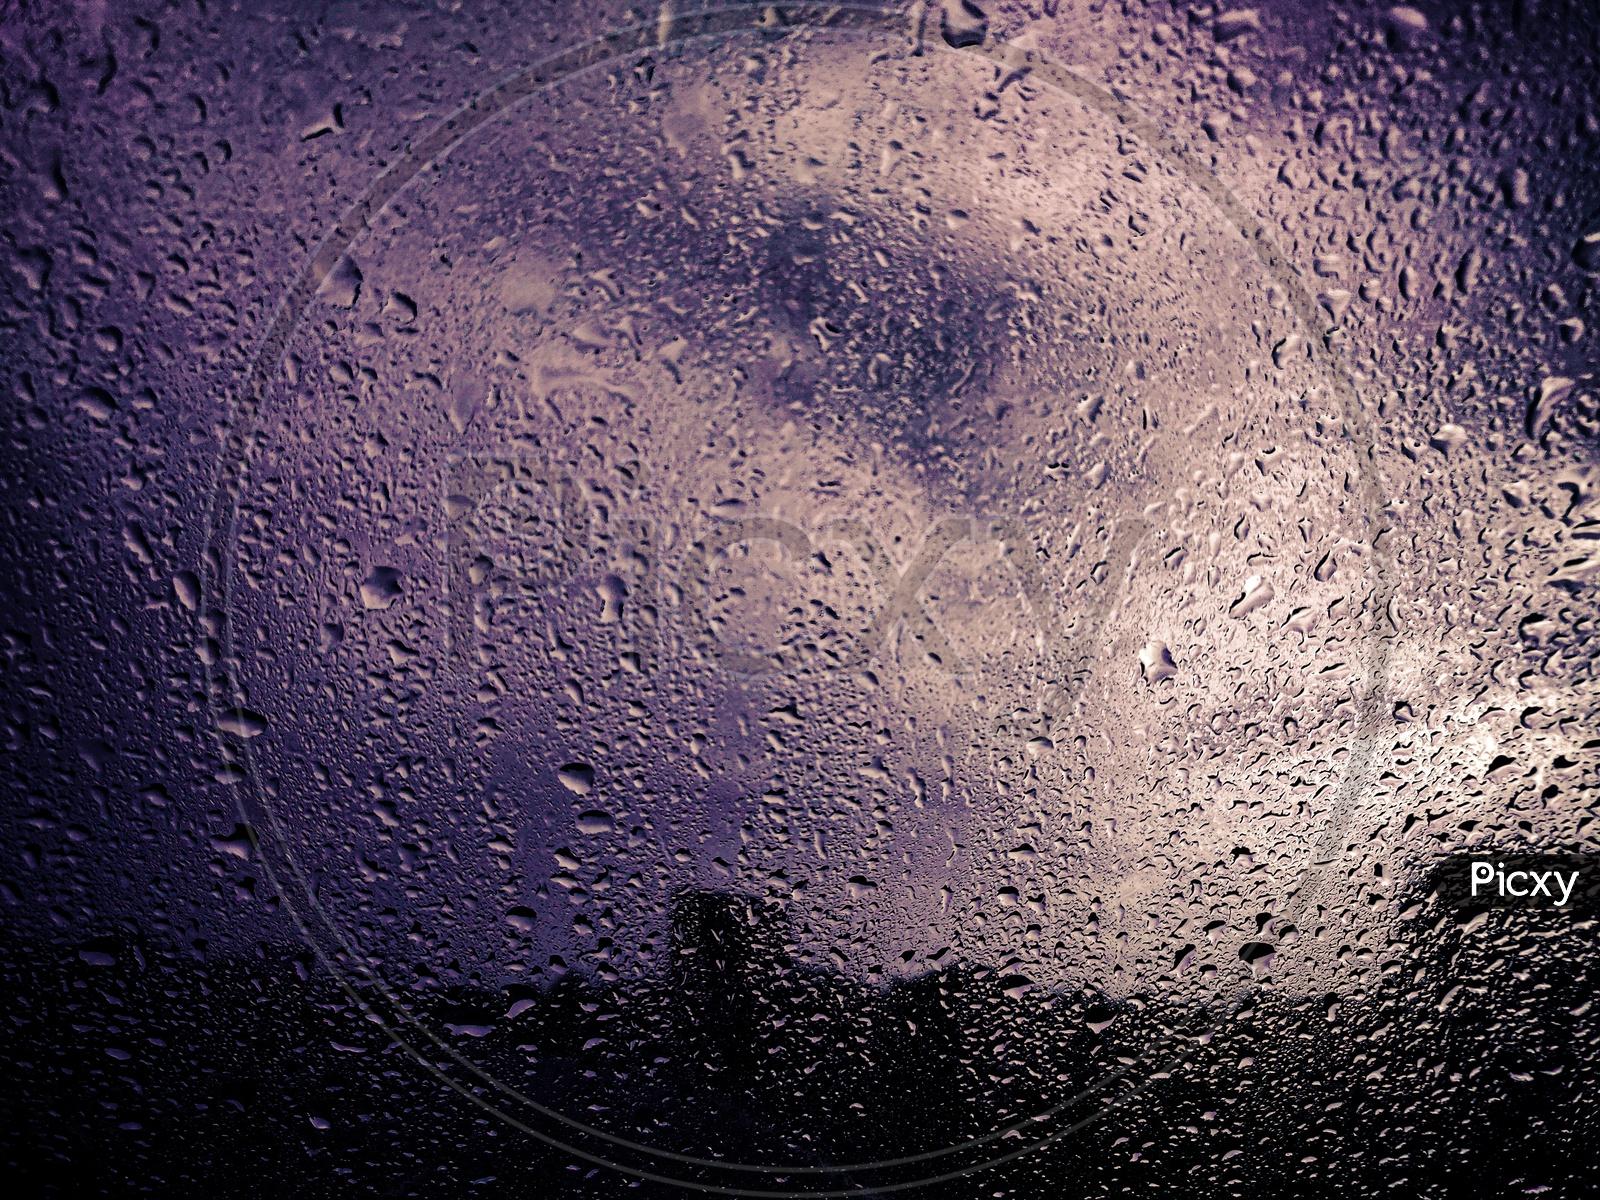 Rain Droplets On A Window Glass Shield